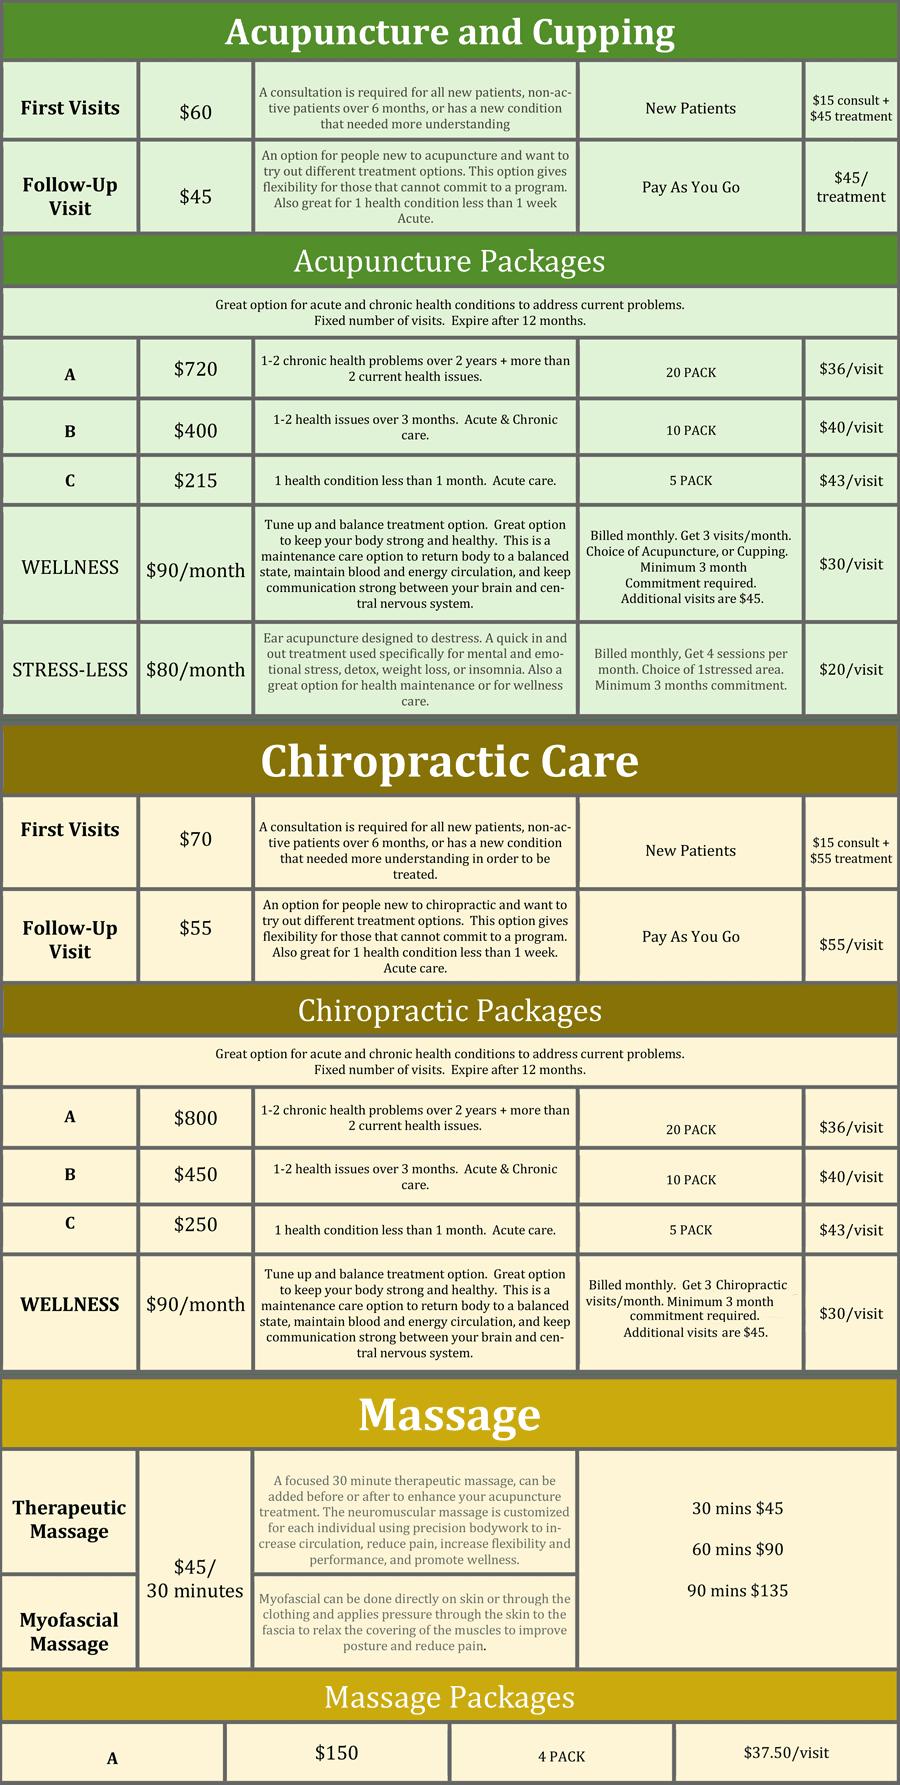 Fee and Referral Program - San Jose, CA: Numo Acupuncture